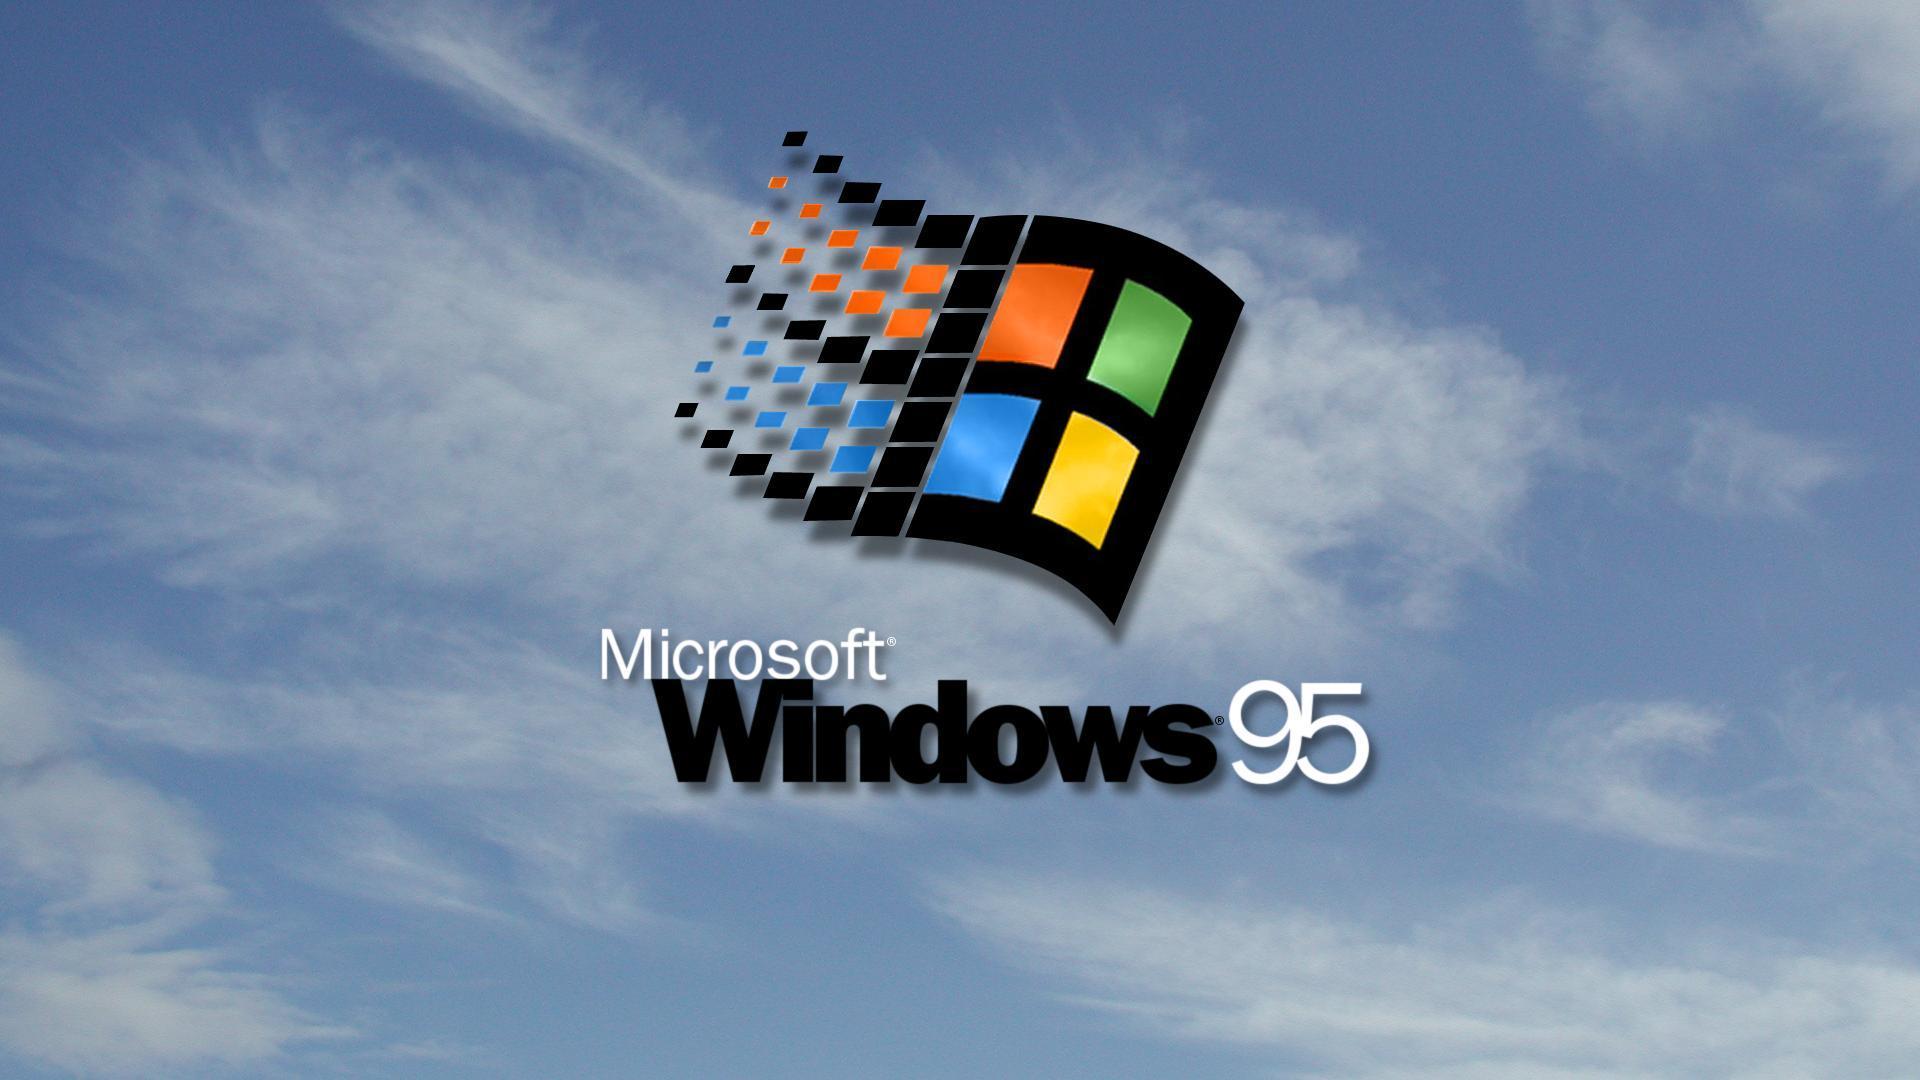 windows 98 wallpaper7 - photo #9